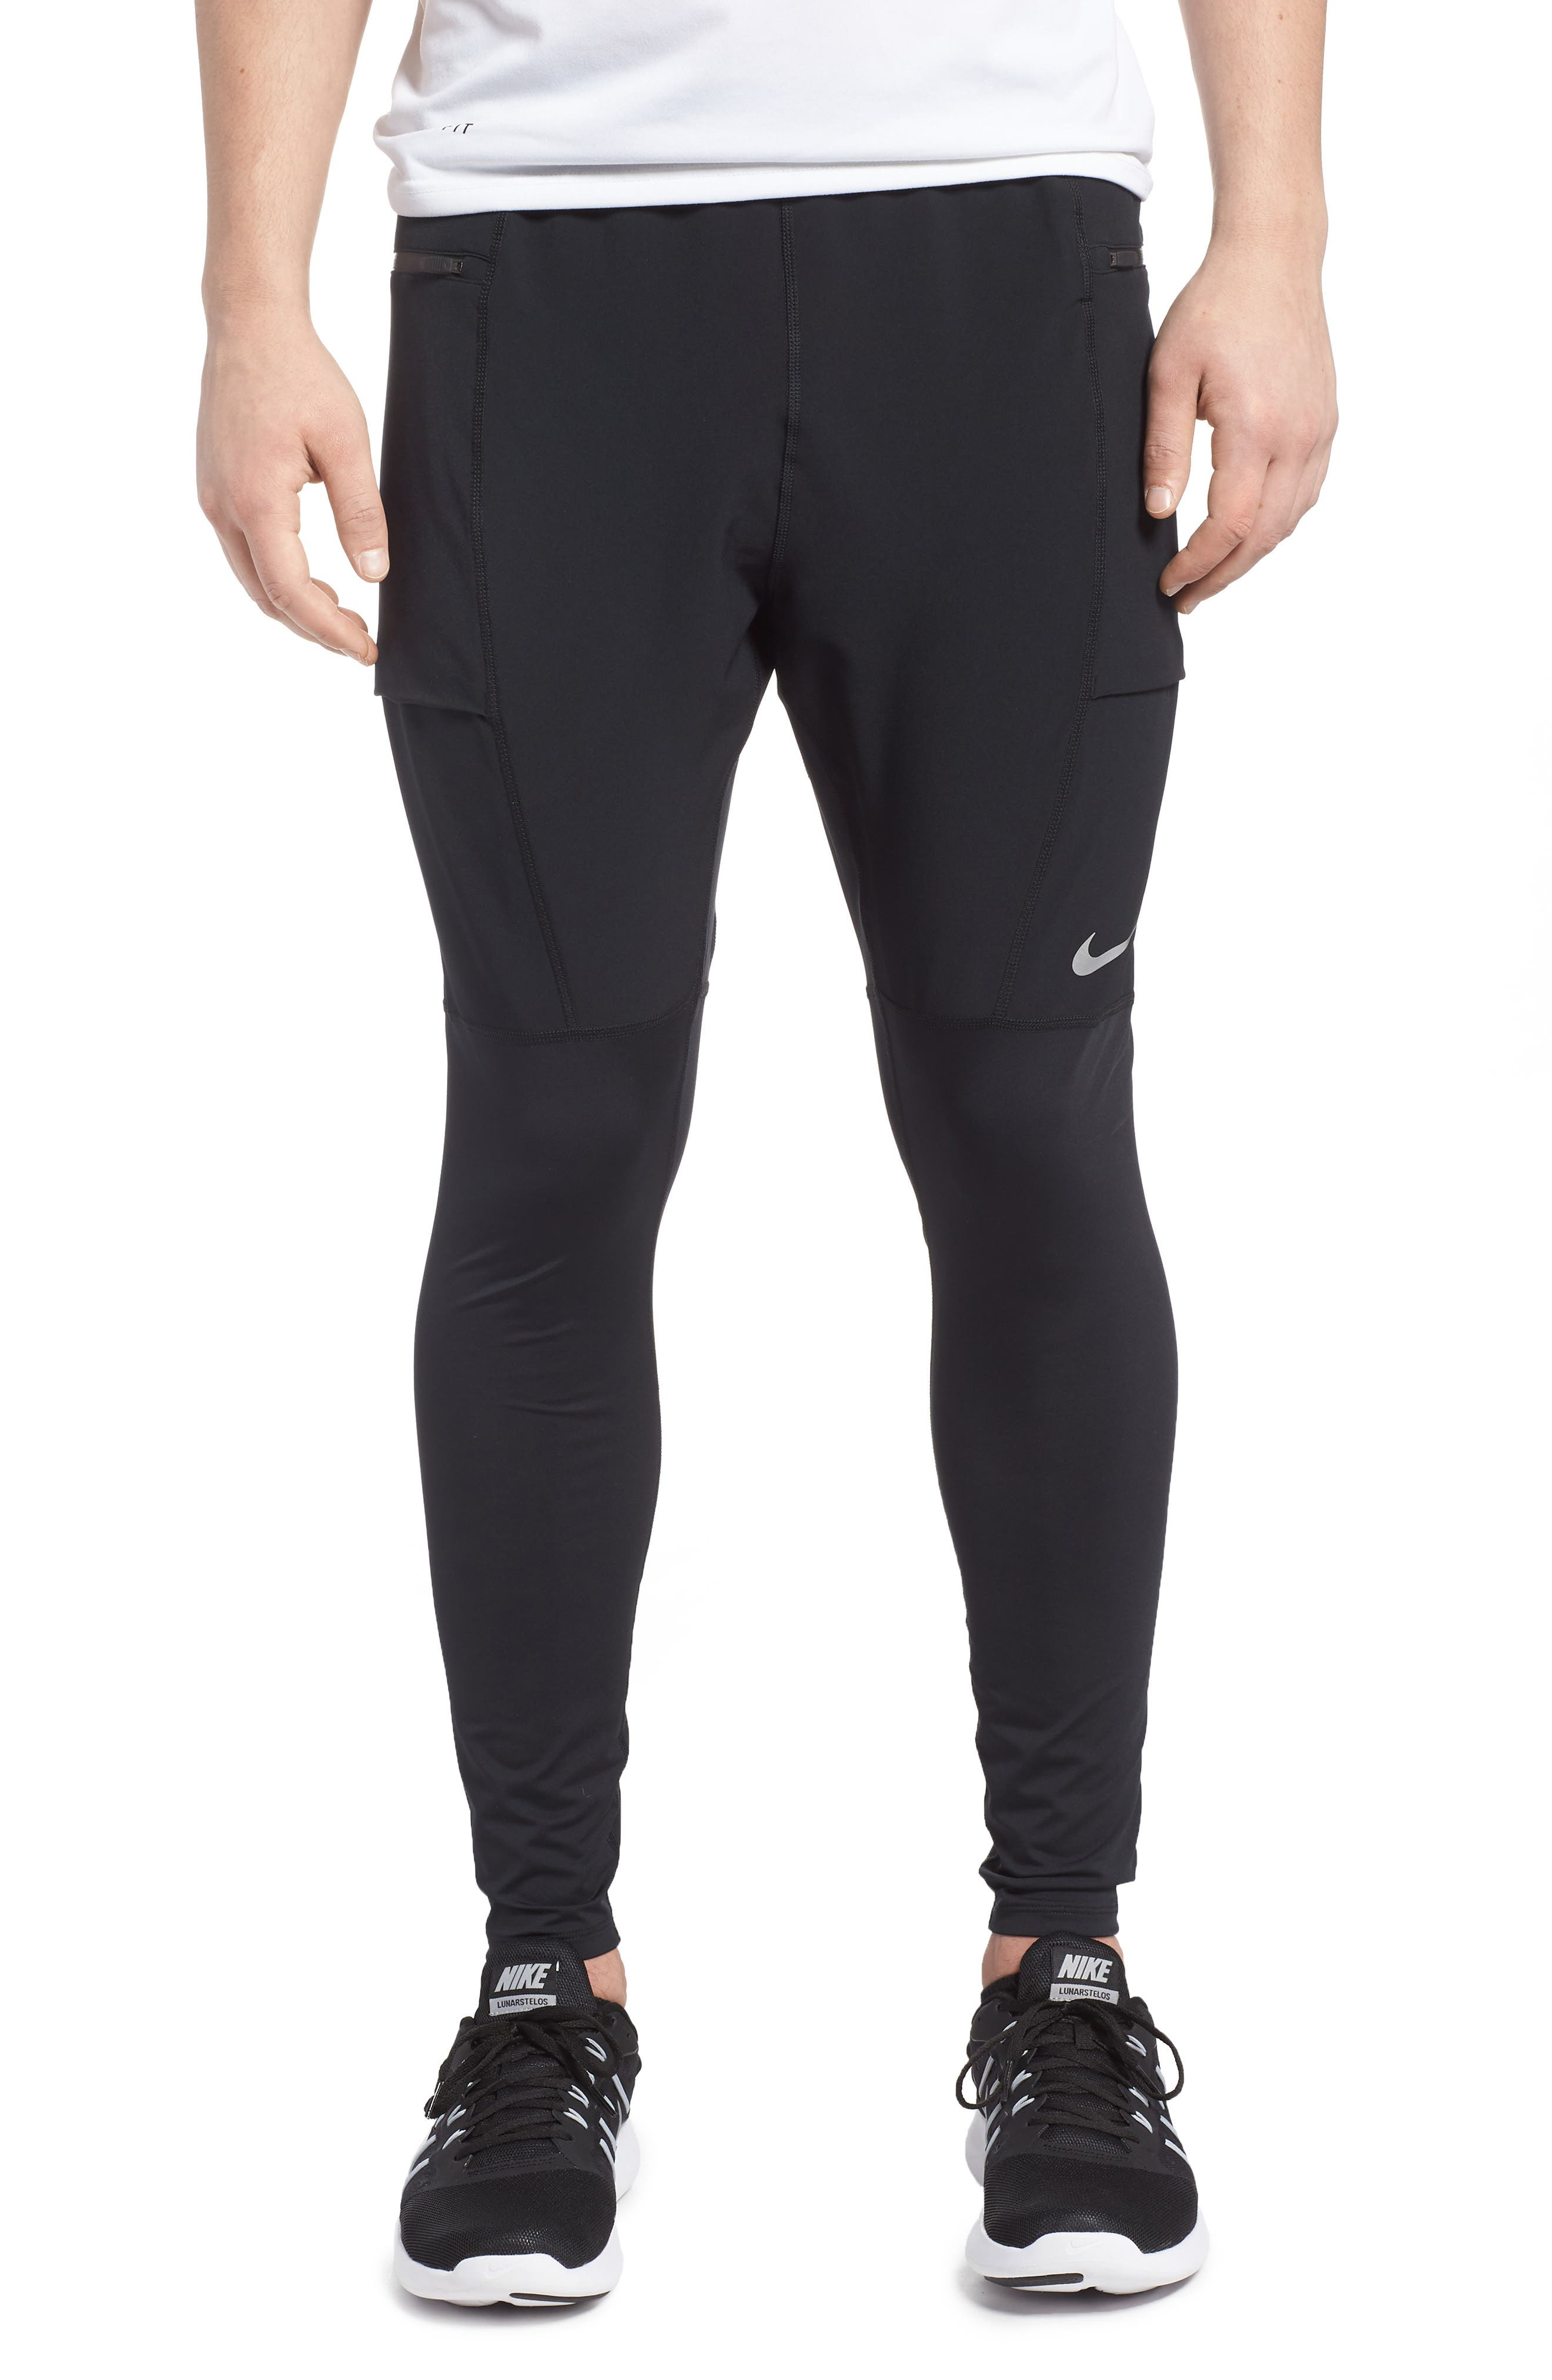 Utility Running Pants,                             Main thumbnail 1, color,                             BLACK